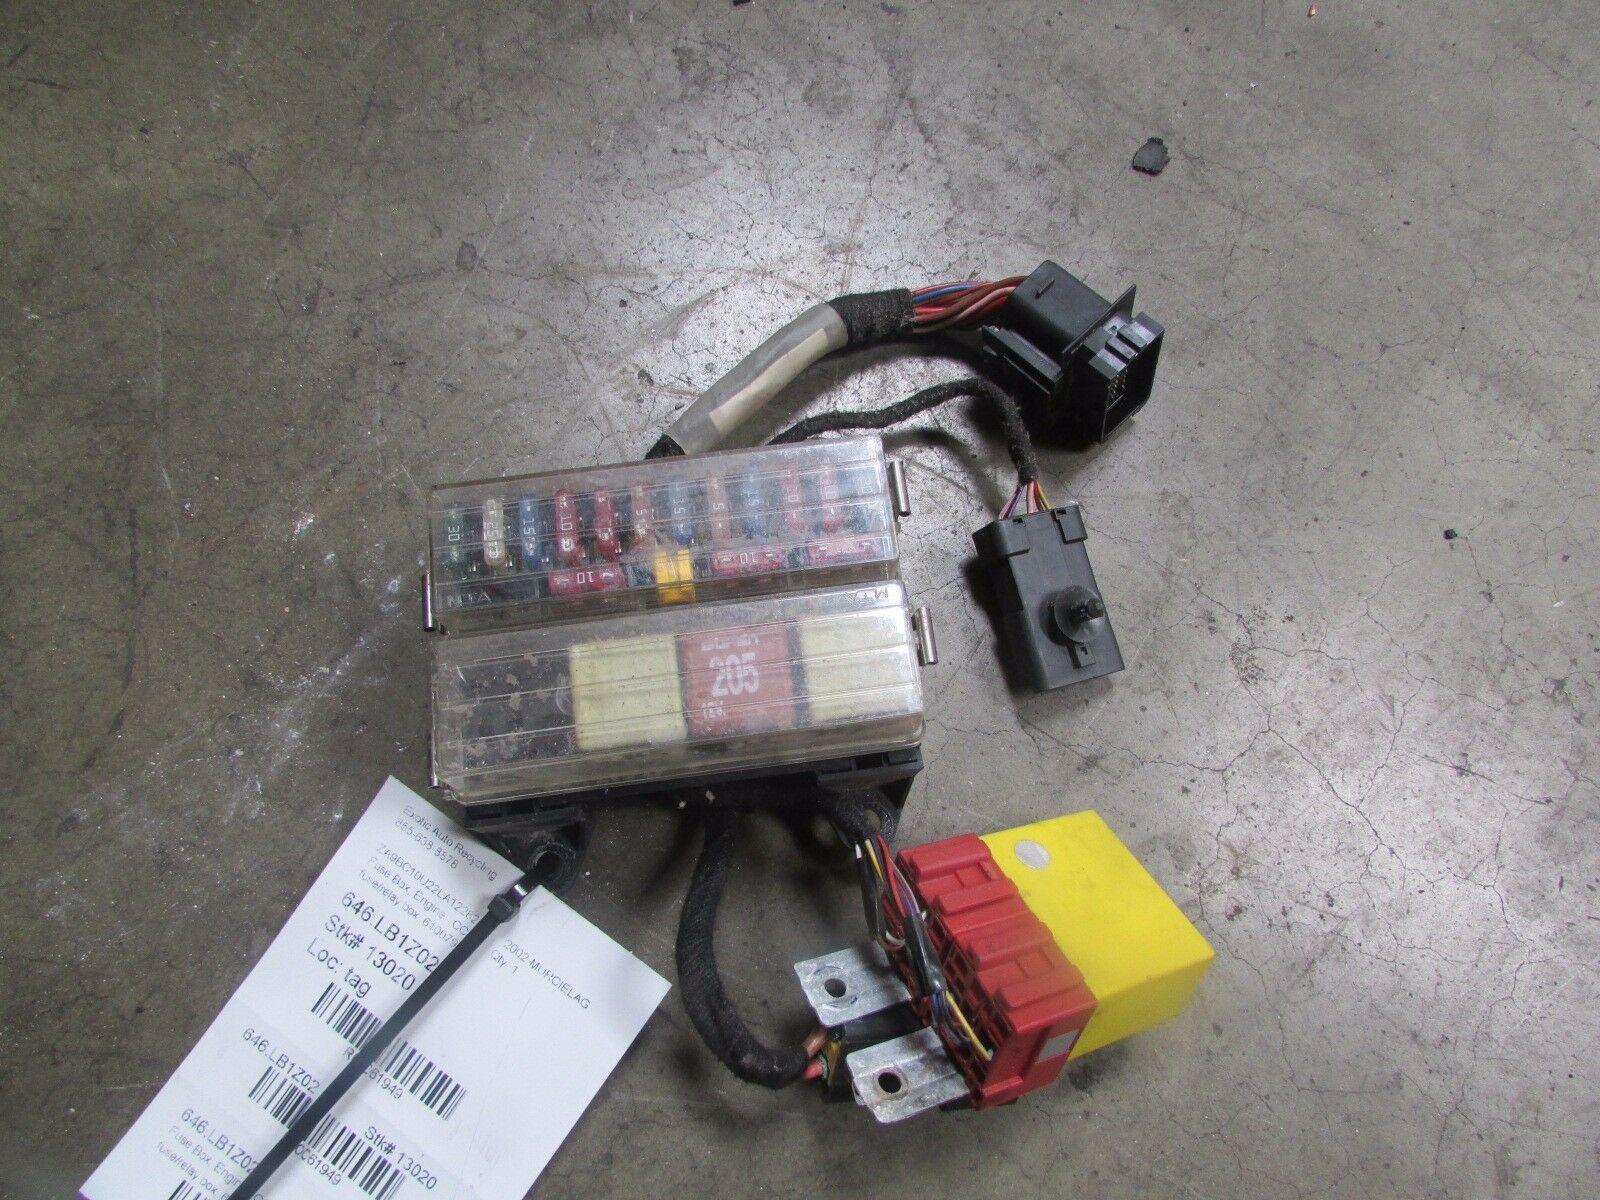 Lamborghini Murcielago, Fuse/Relay Box, Fuse Box, Used, P/N 61007933 on switch box, cover box, generator box, the last of us box, tube box, relay box, layout for hexagonal box, power box, four box, meter box, junction box, style box, case box, ground box, circuit box, dark box, breaker box, watch dogs box, clip box, transformer box,